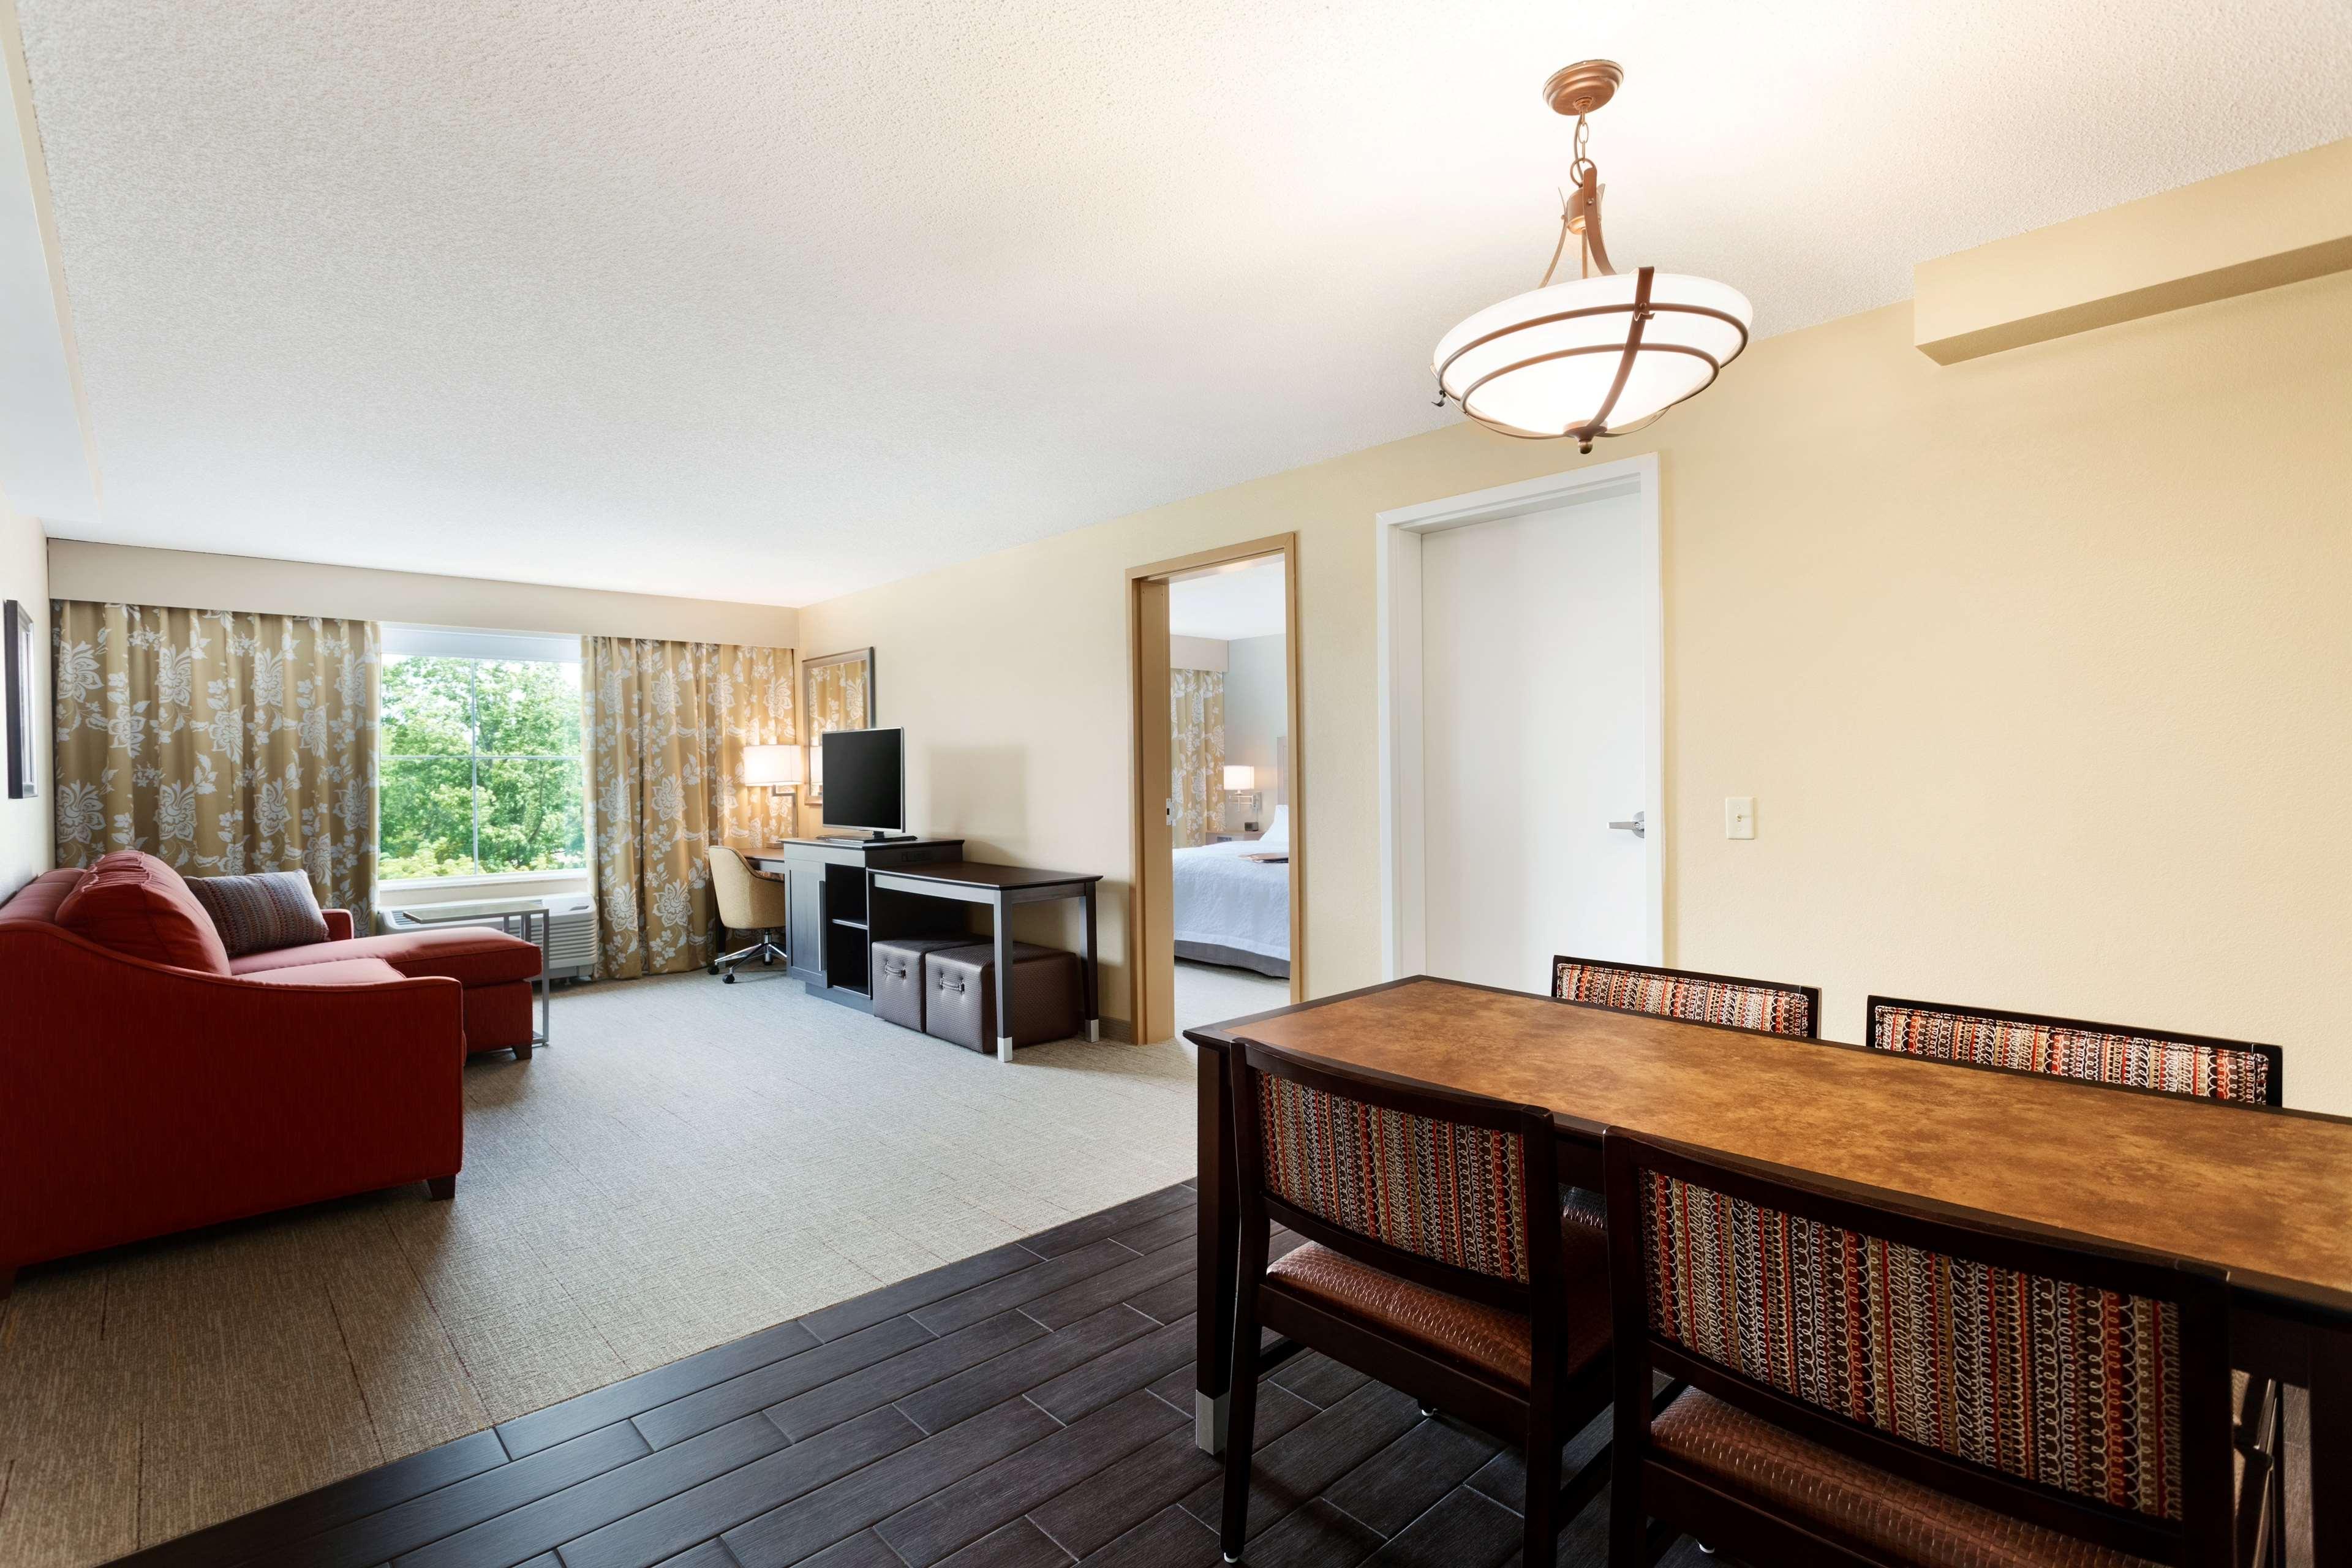 Hampton Inn & Suites Hershey Near The Park image 11